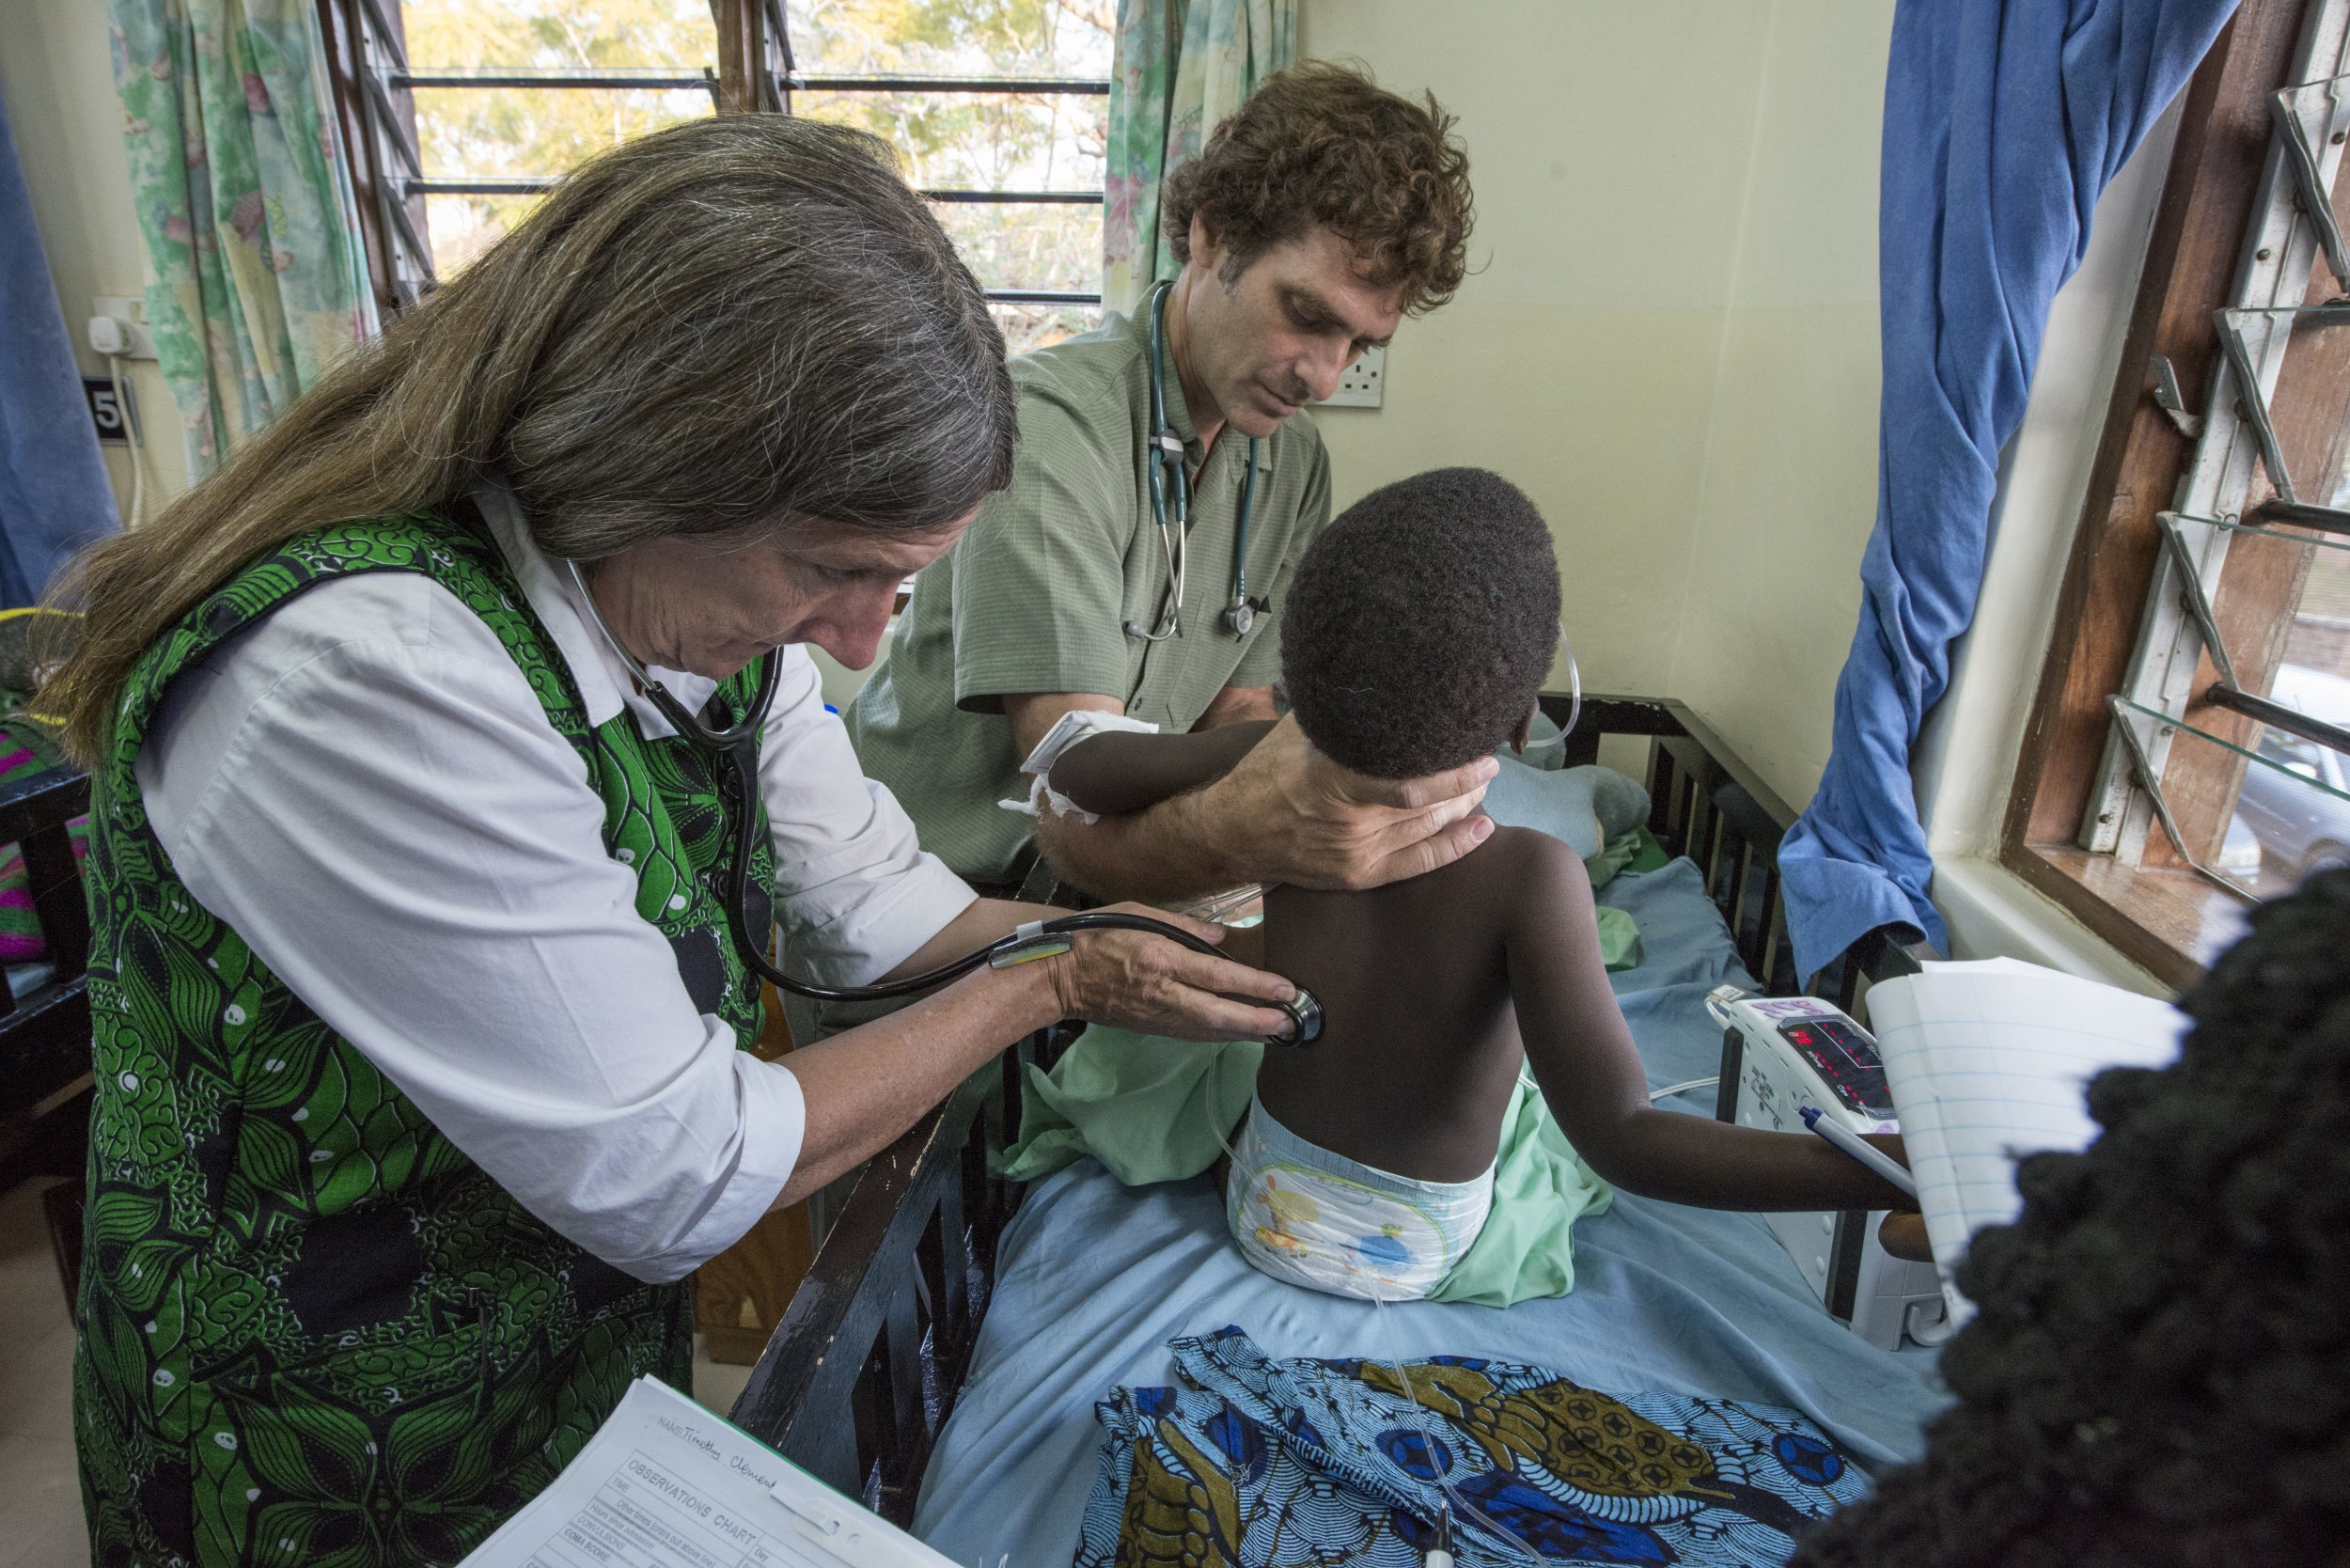 3-19-15 Malaria study